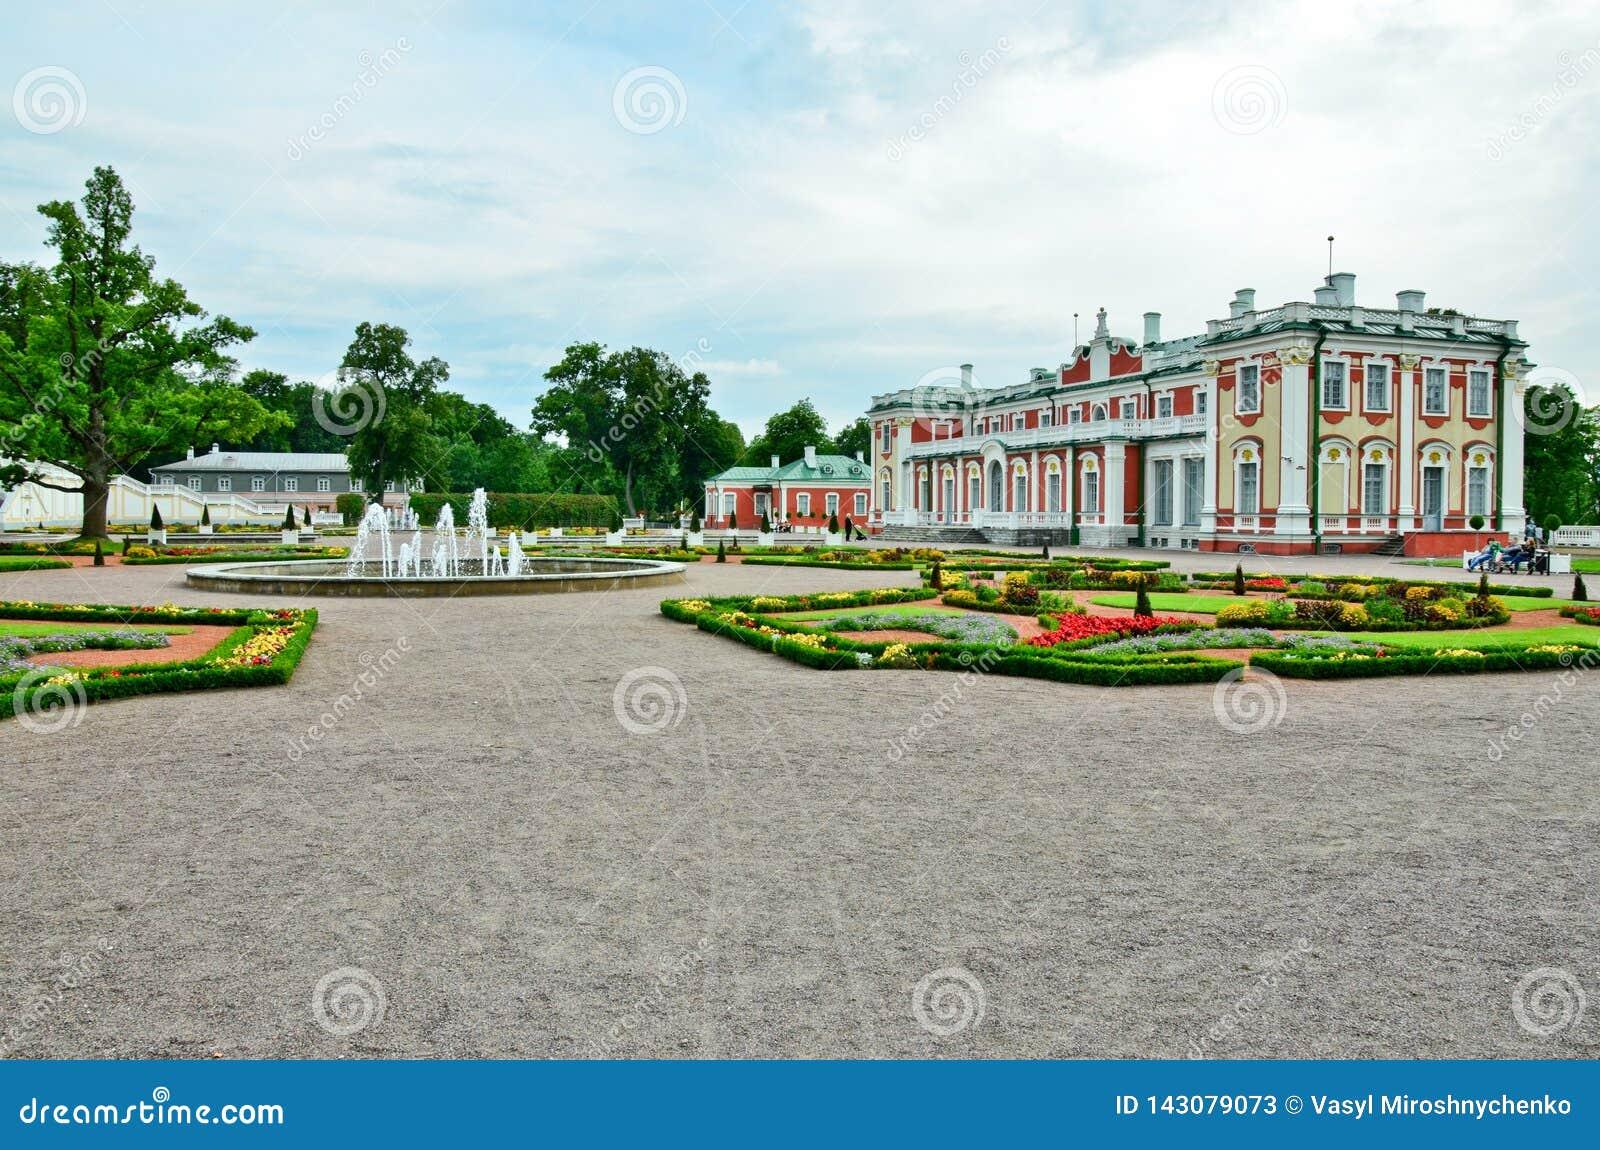 Часть дворца Kadriorg ансамбля дворца и парка